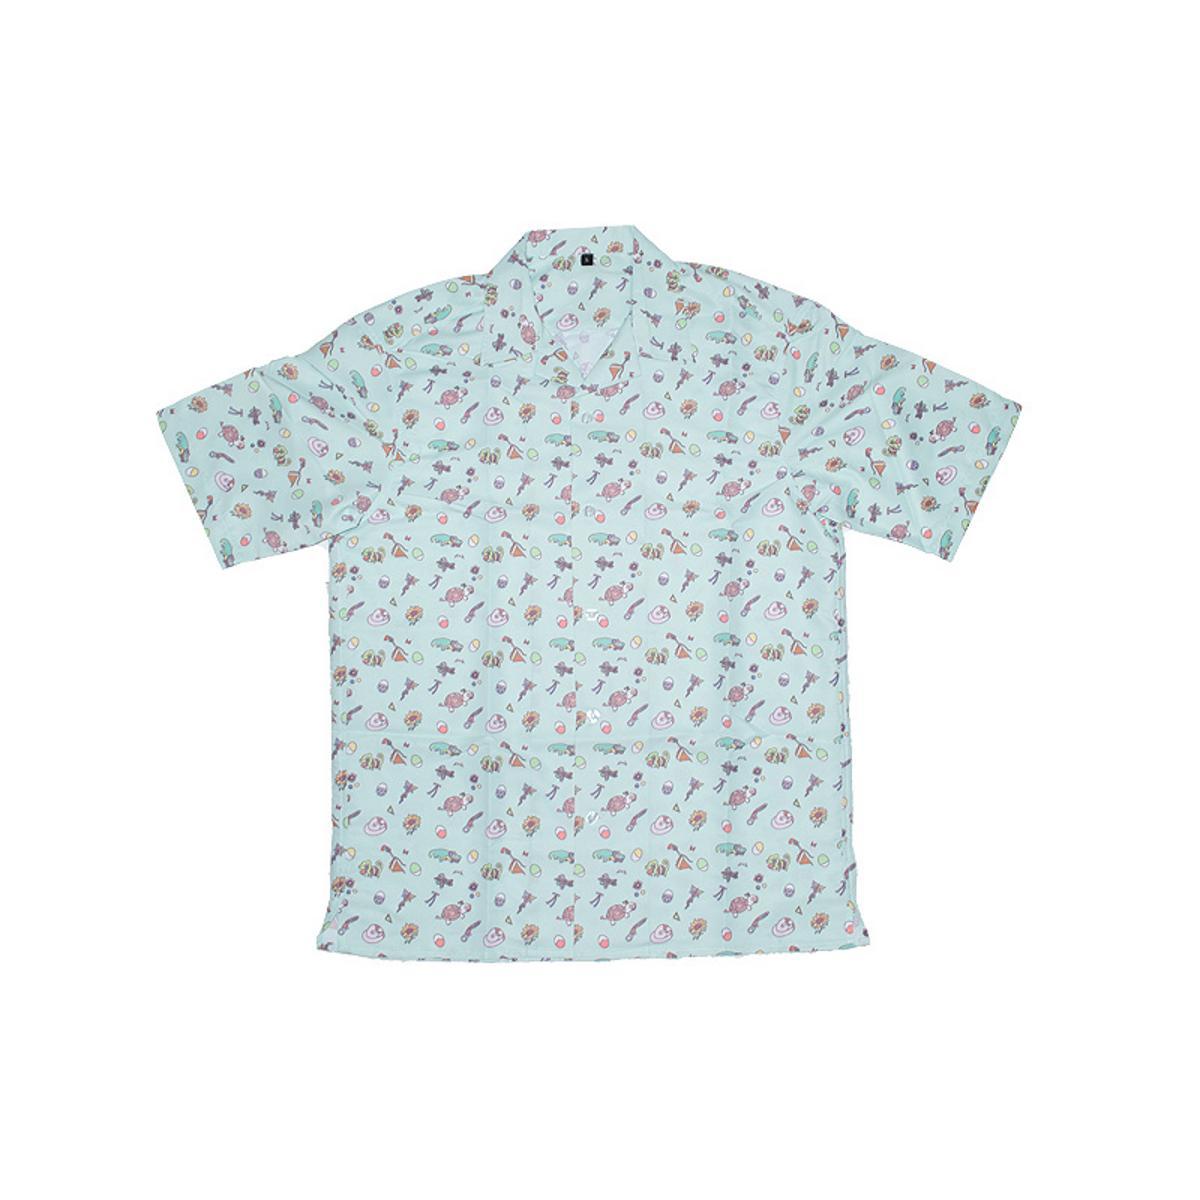 WONDER EGG PRIORITY Open Collar Shirt